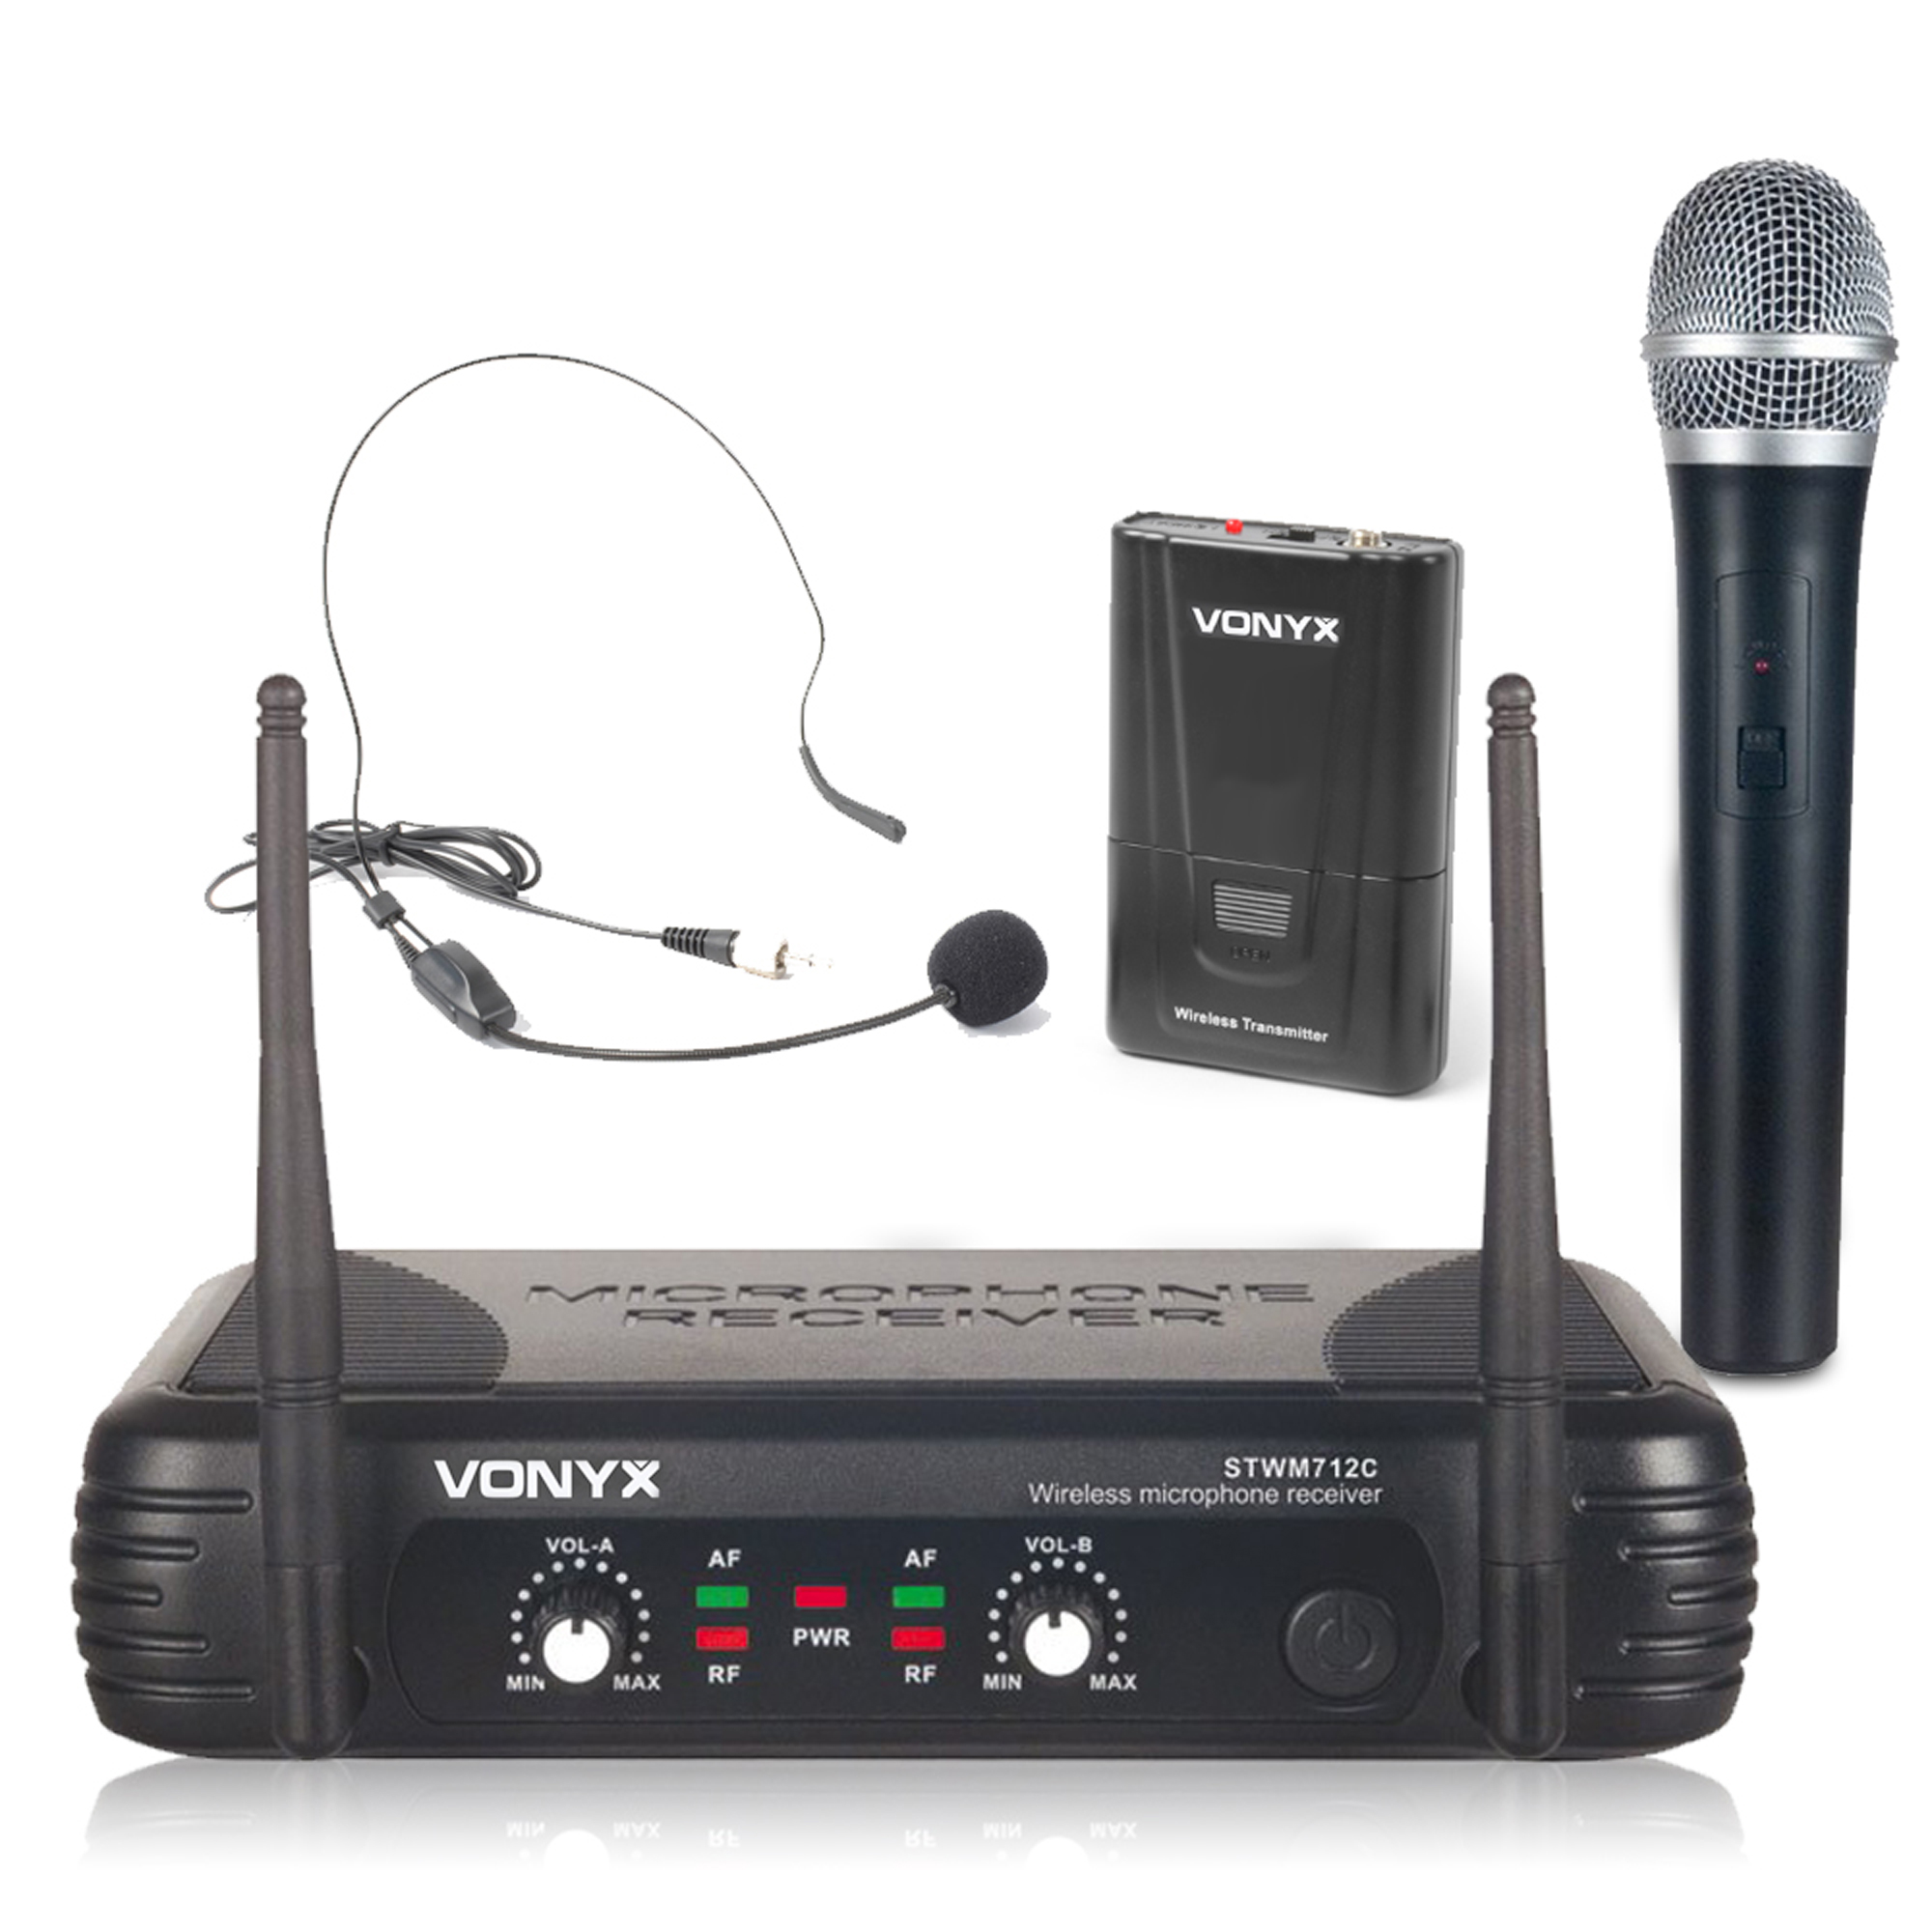 Vonyx STWM712C VHF Wireless Headset & Handheld Microphone System